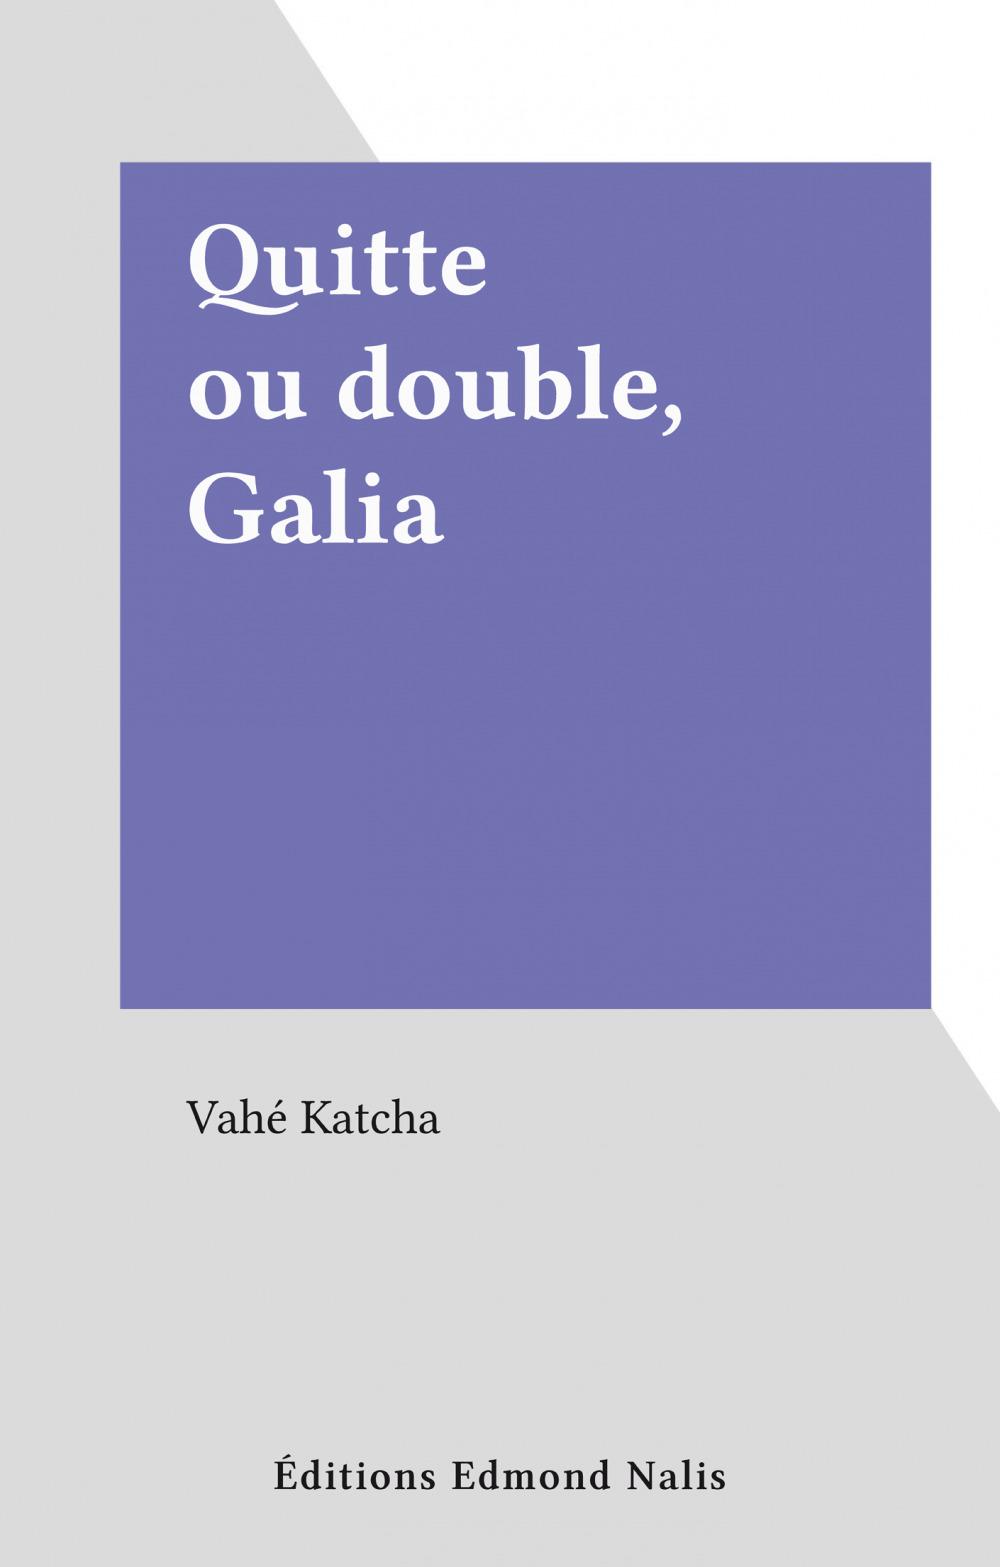 Quitte ou double, Galia